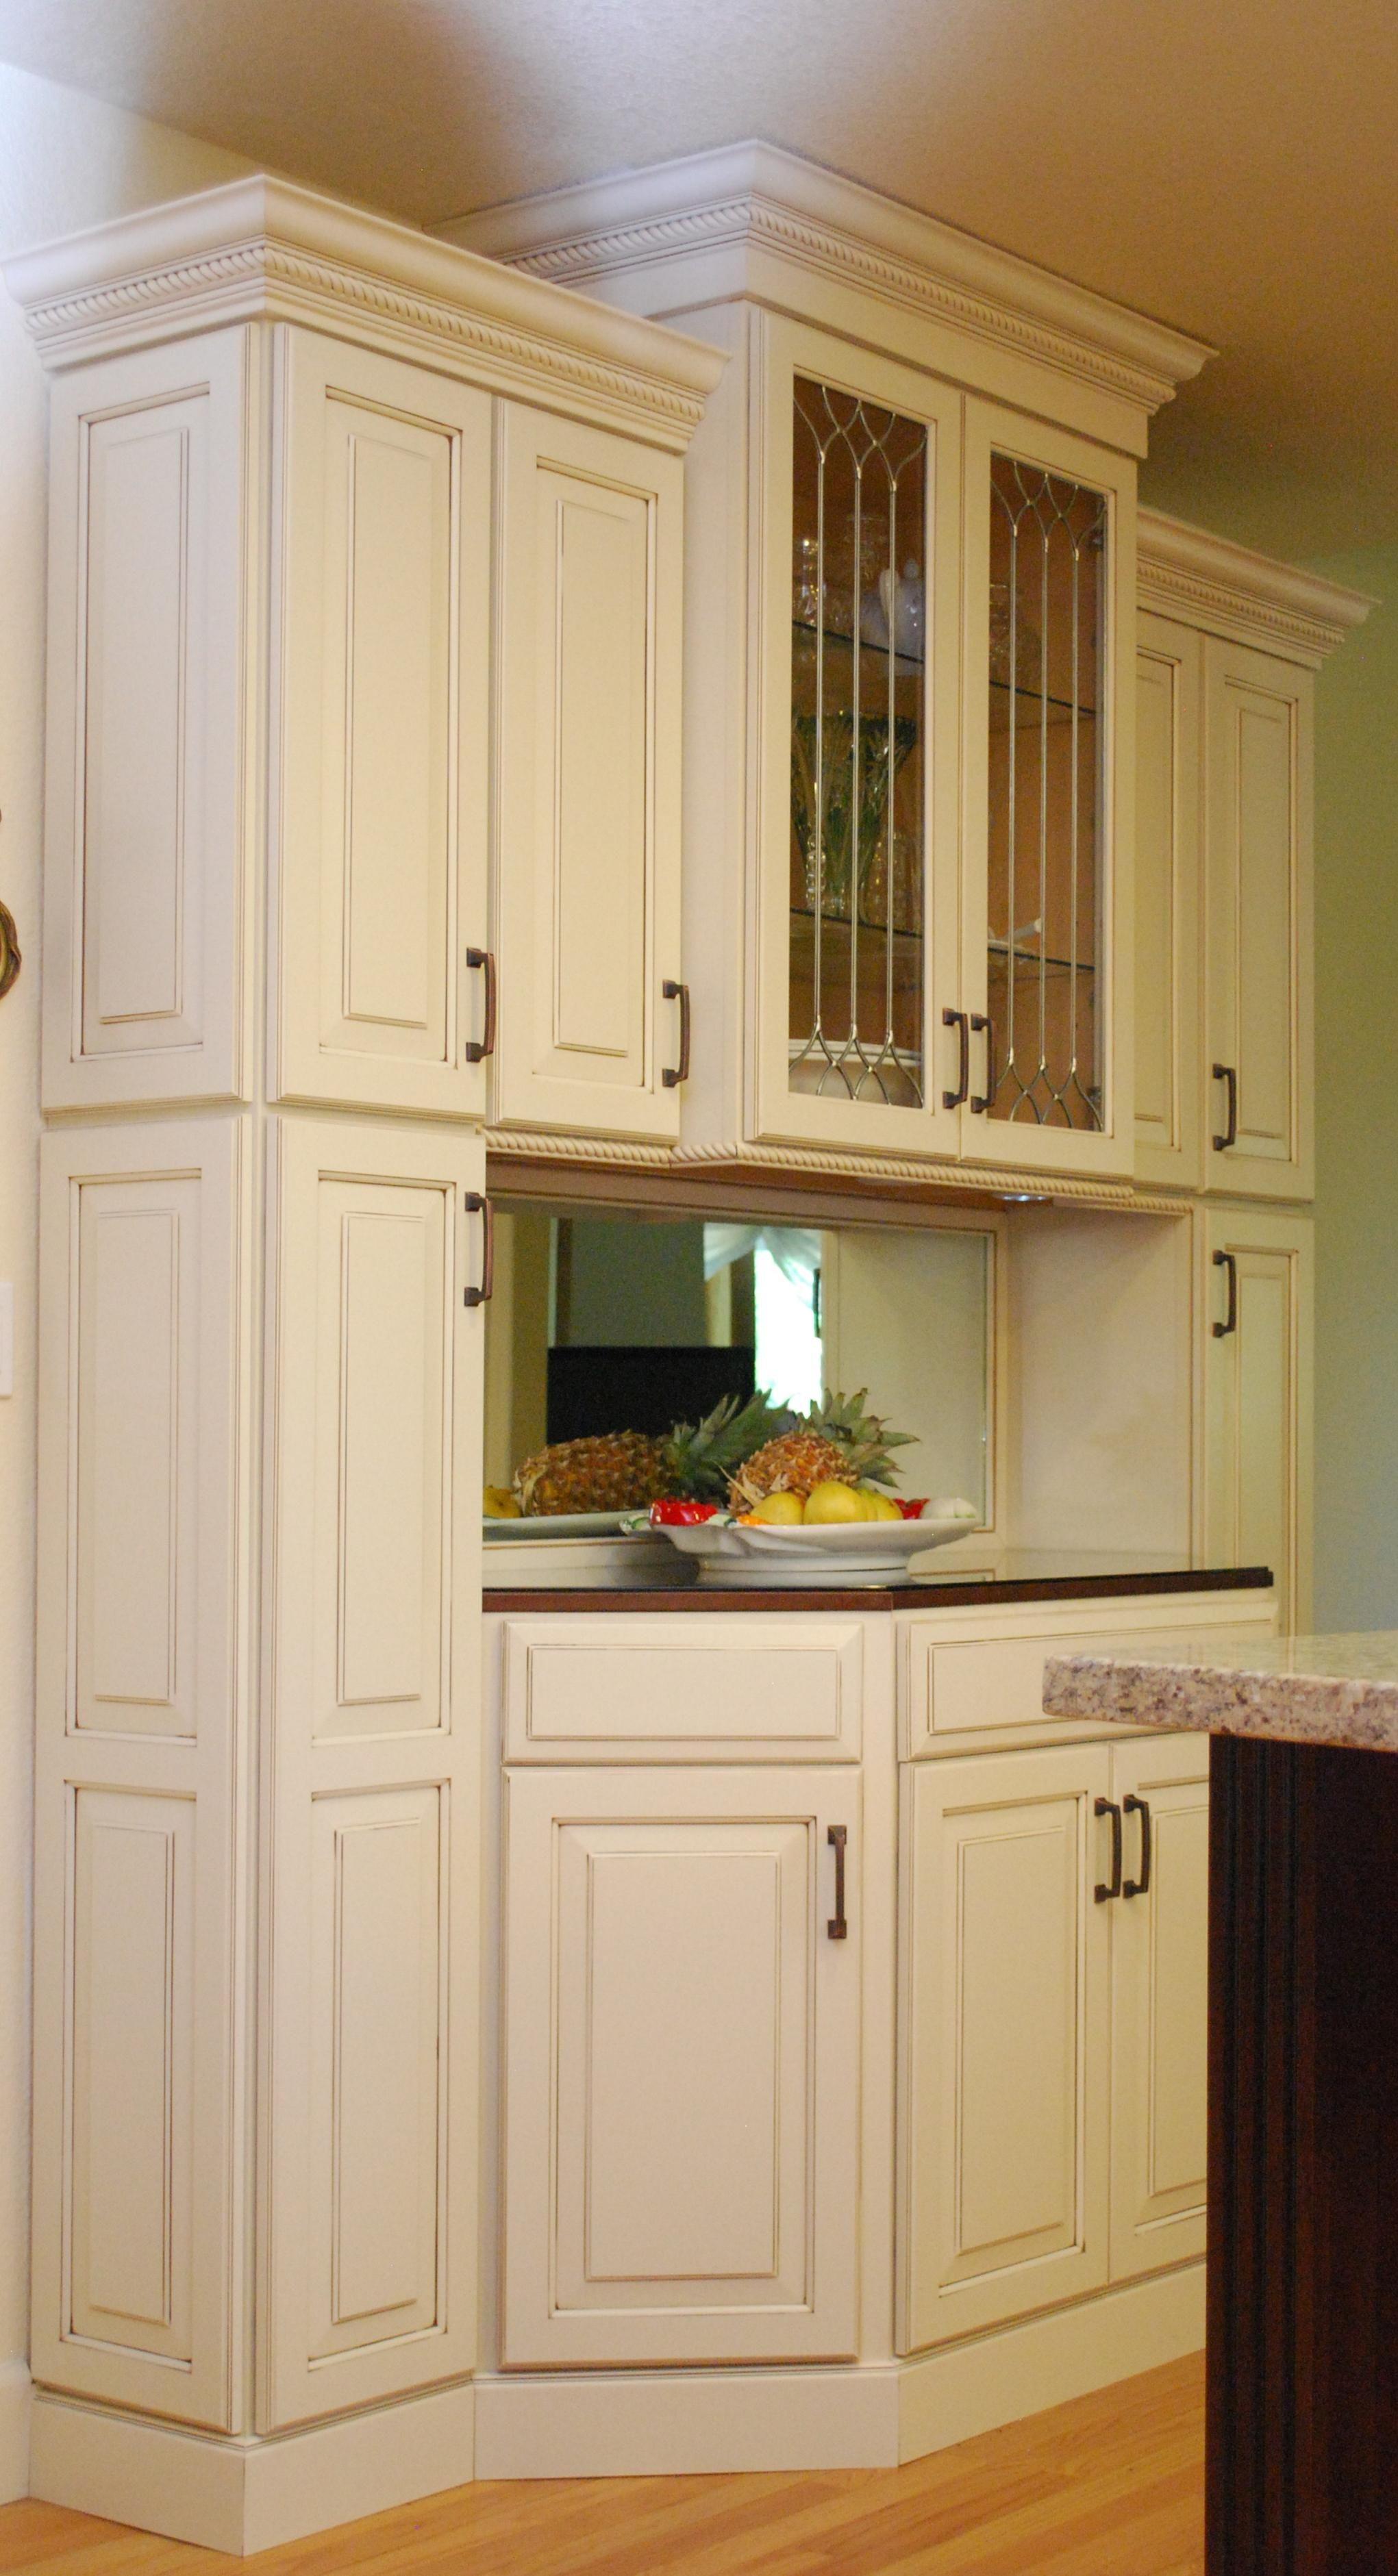 waypoint kitchen cabinets corner table sets living spaces style 610 in maple hazelnut glaze